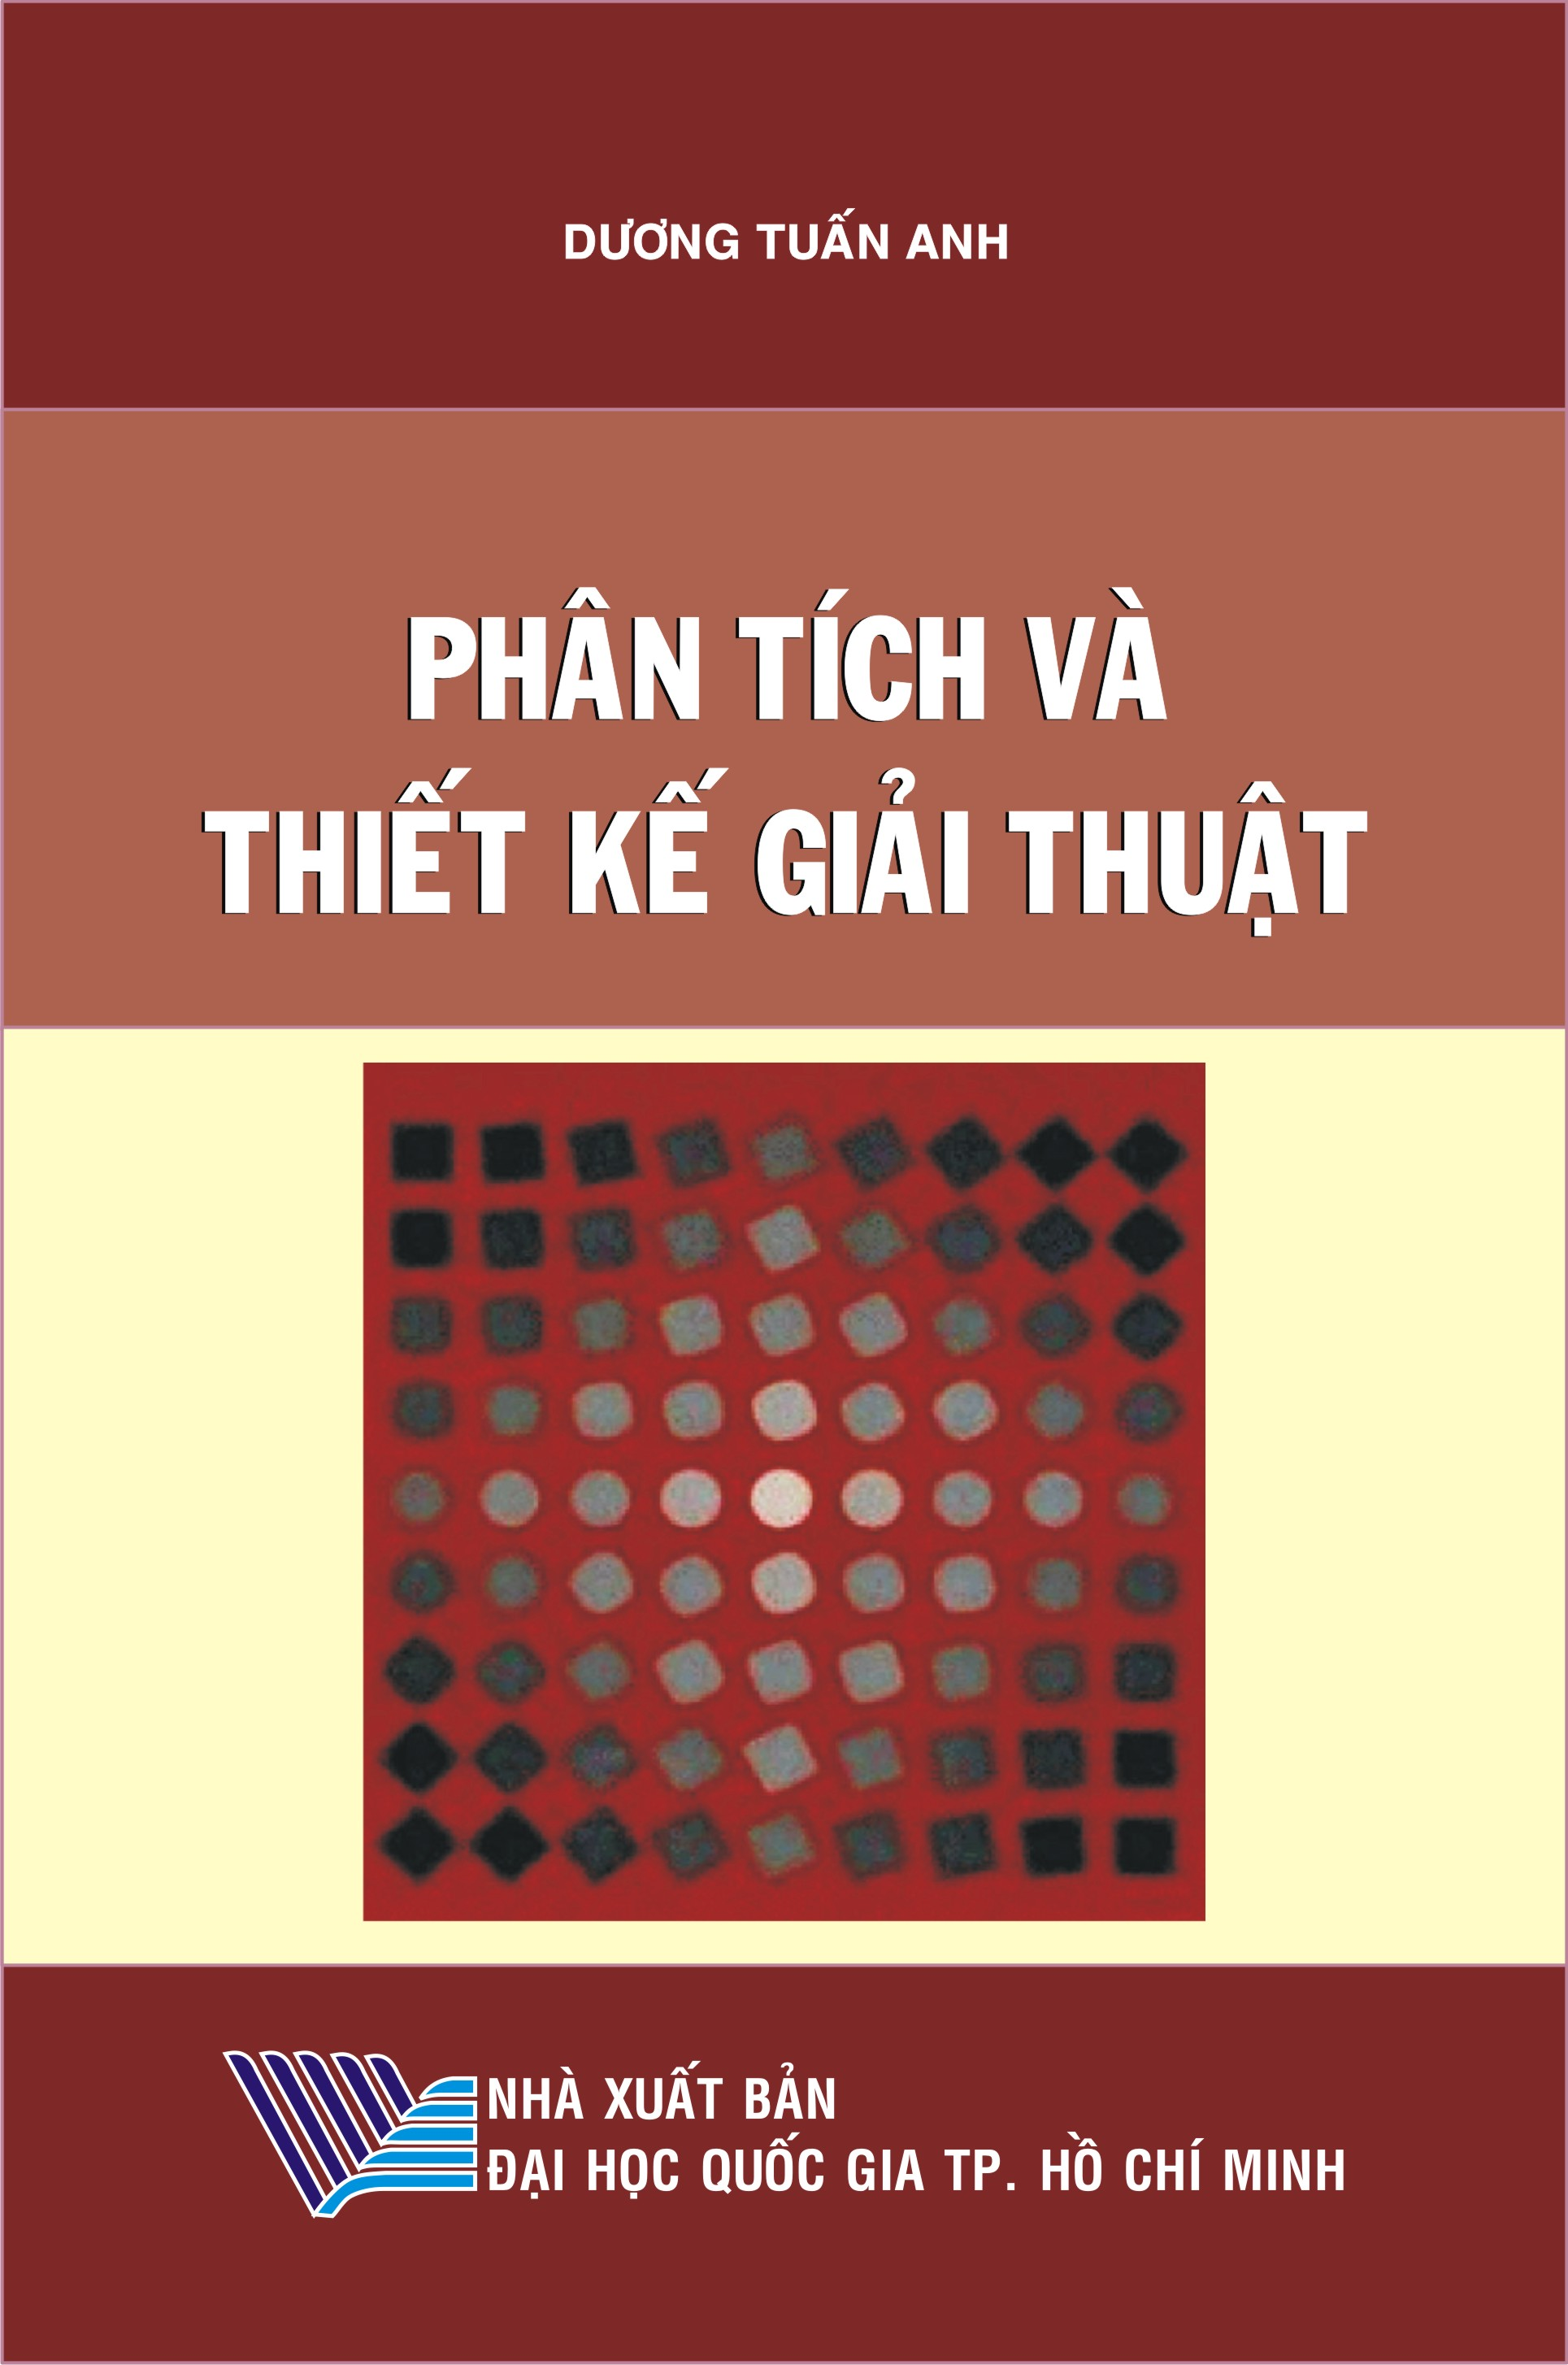 http://www.bgt.hcmut.edu.vn/images/stories/virtuemart/product/phan_tich_va_thiet_ke_giai_thuat.jpg